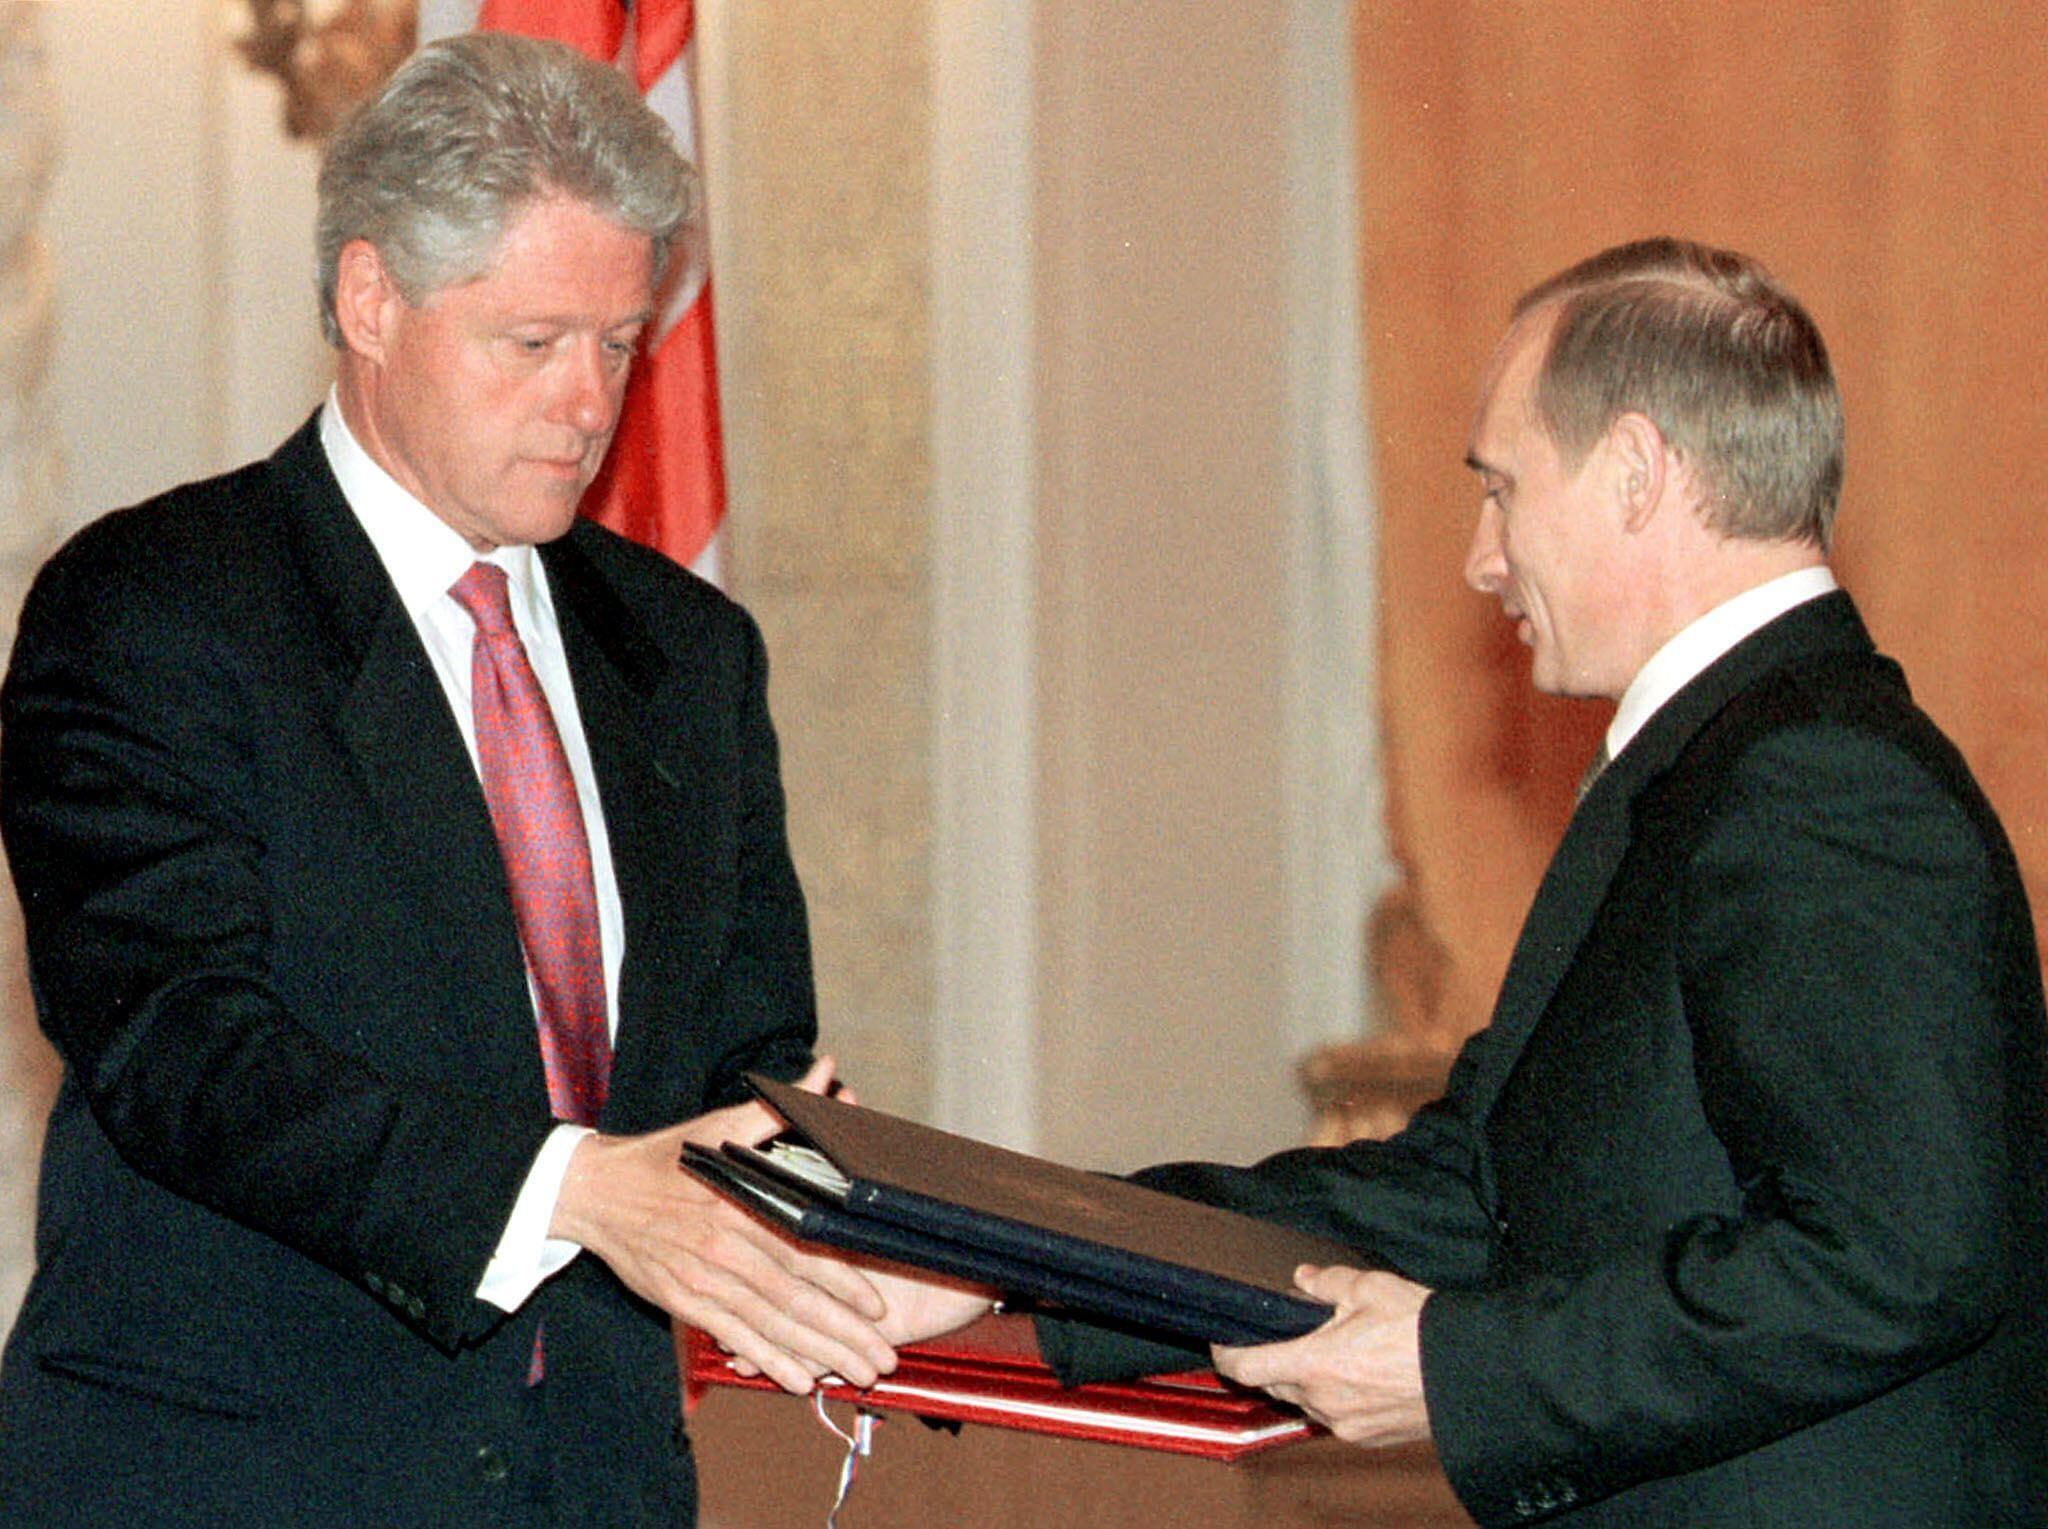 Билл Клинтон и Владимир Путин в Кремле 4 мюня 2000.